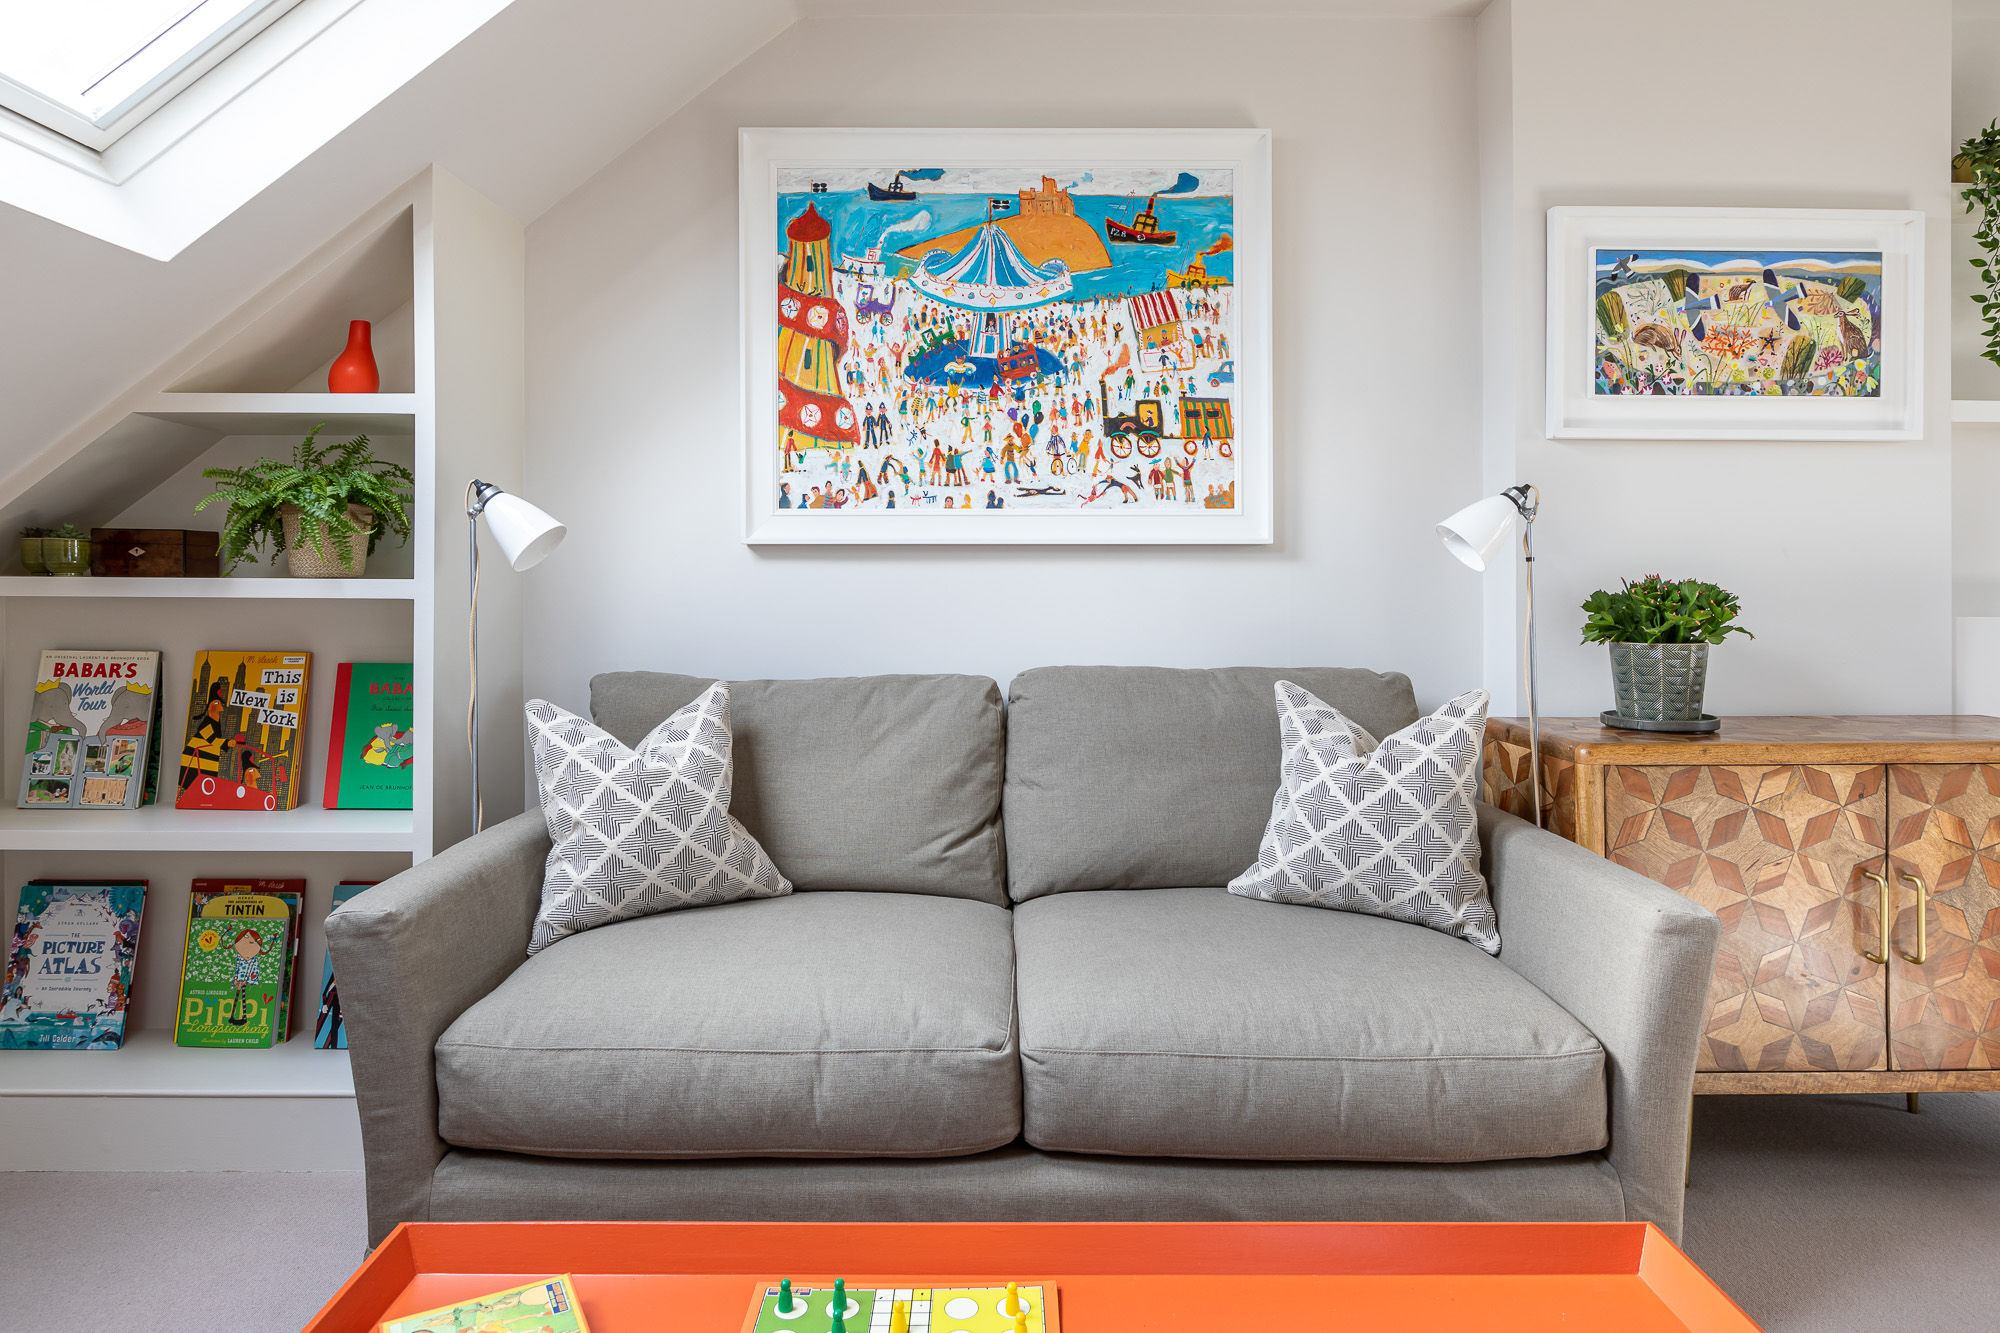 jonathan bond, 2 seater sofa & floor lamps, clapham, london